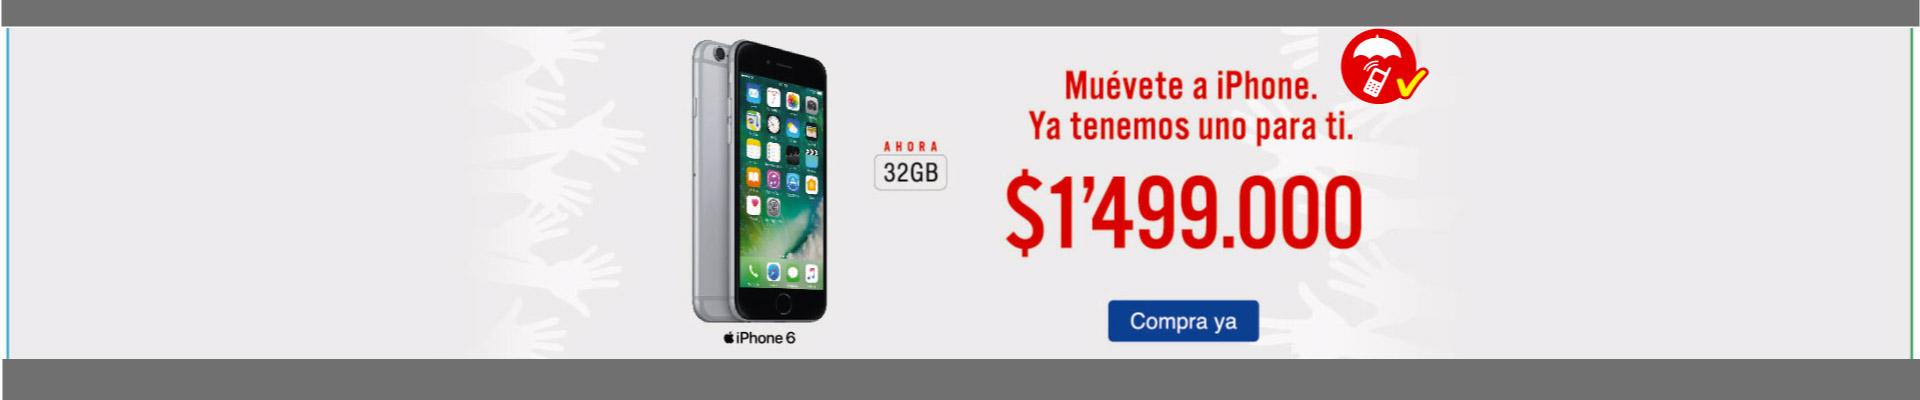 iPhone 6 32GB 4G - celulares